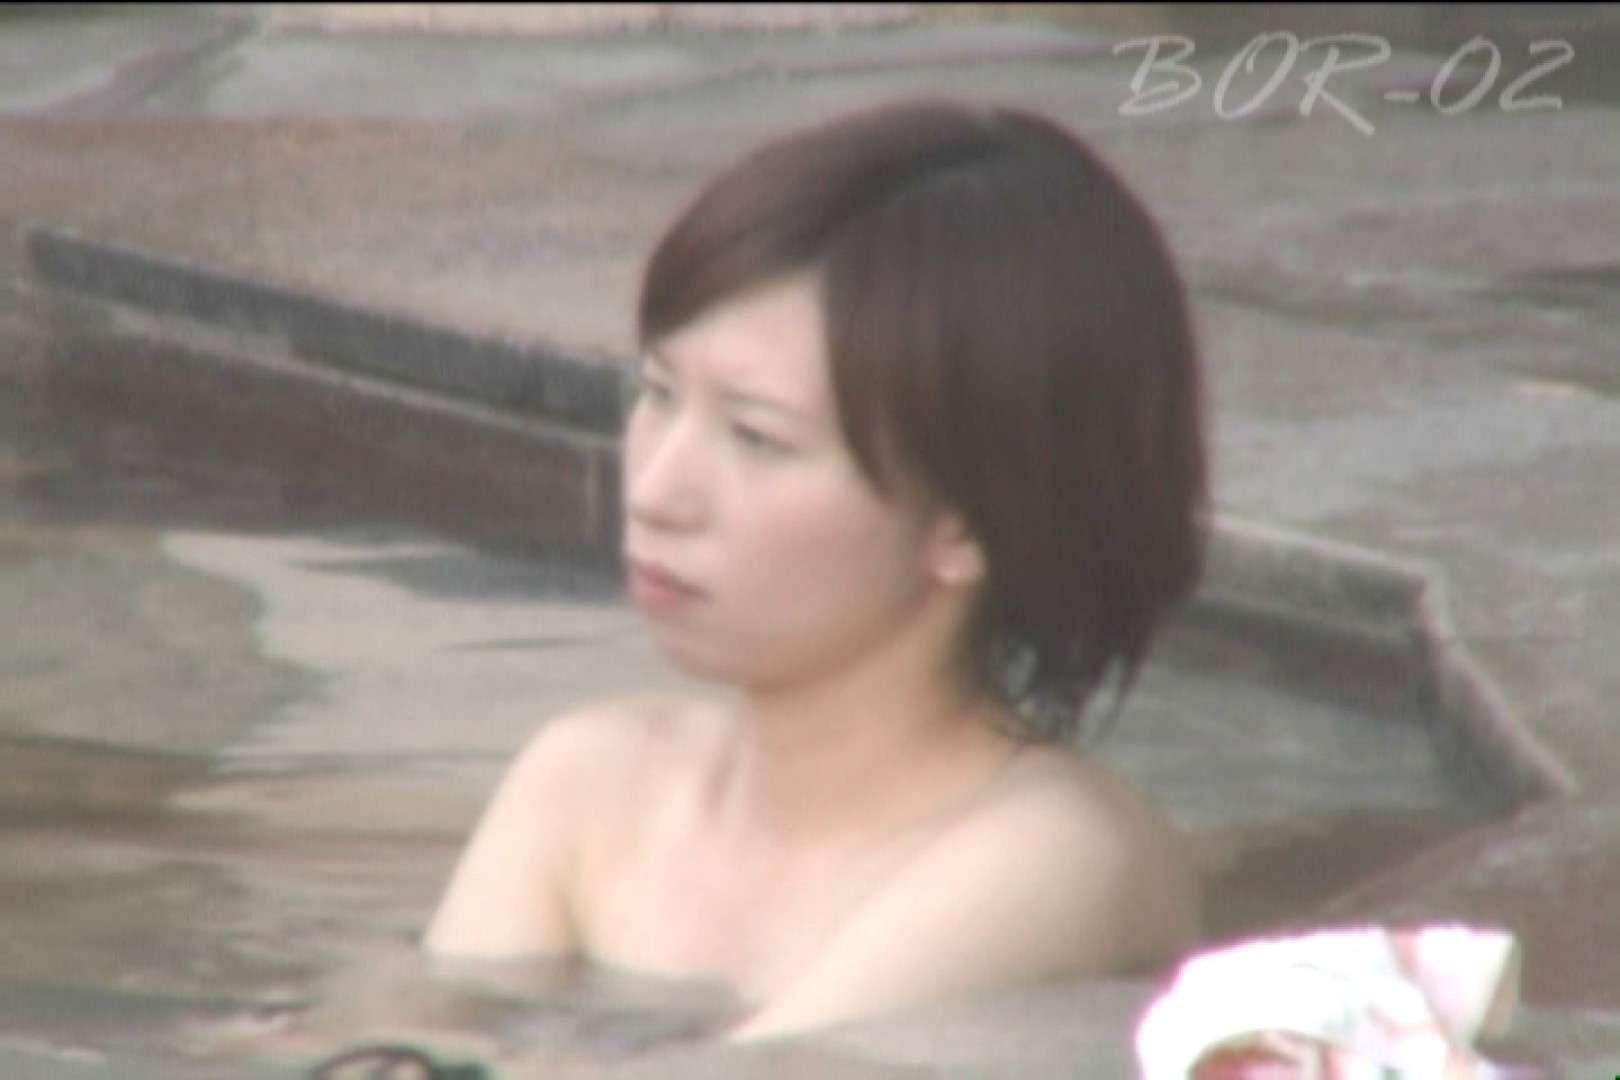 Aquaな露天風呂Vol.475 露天 | OLセックス  96画像 22